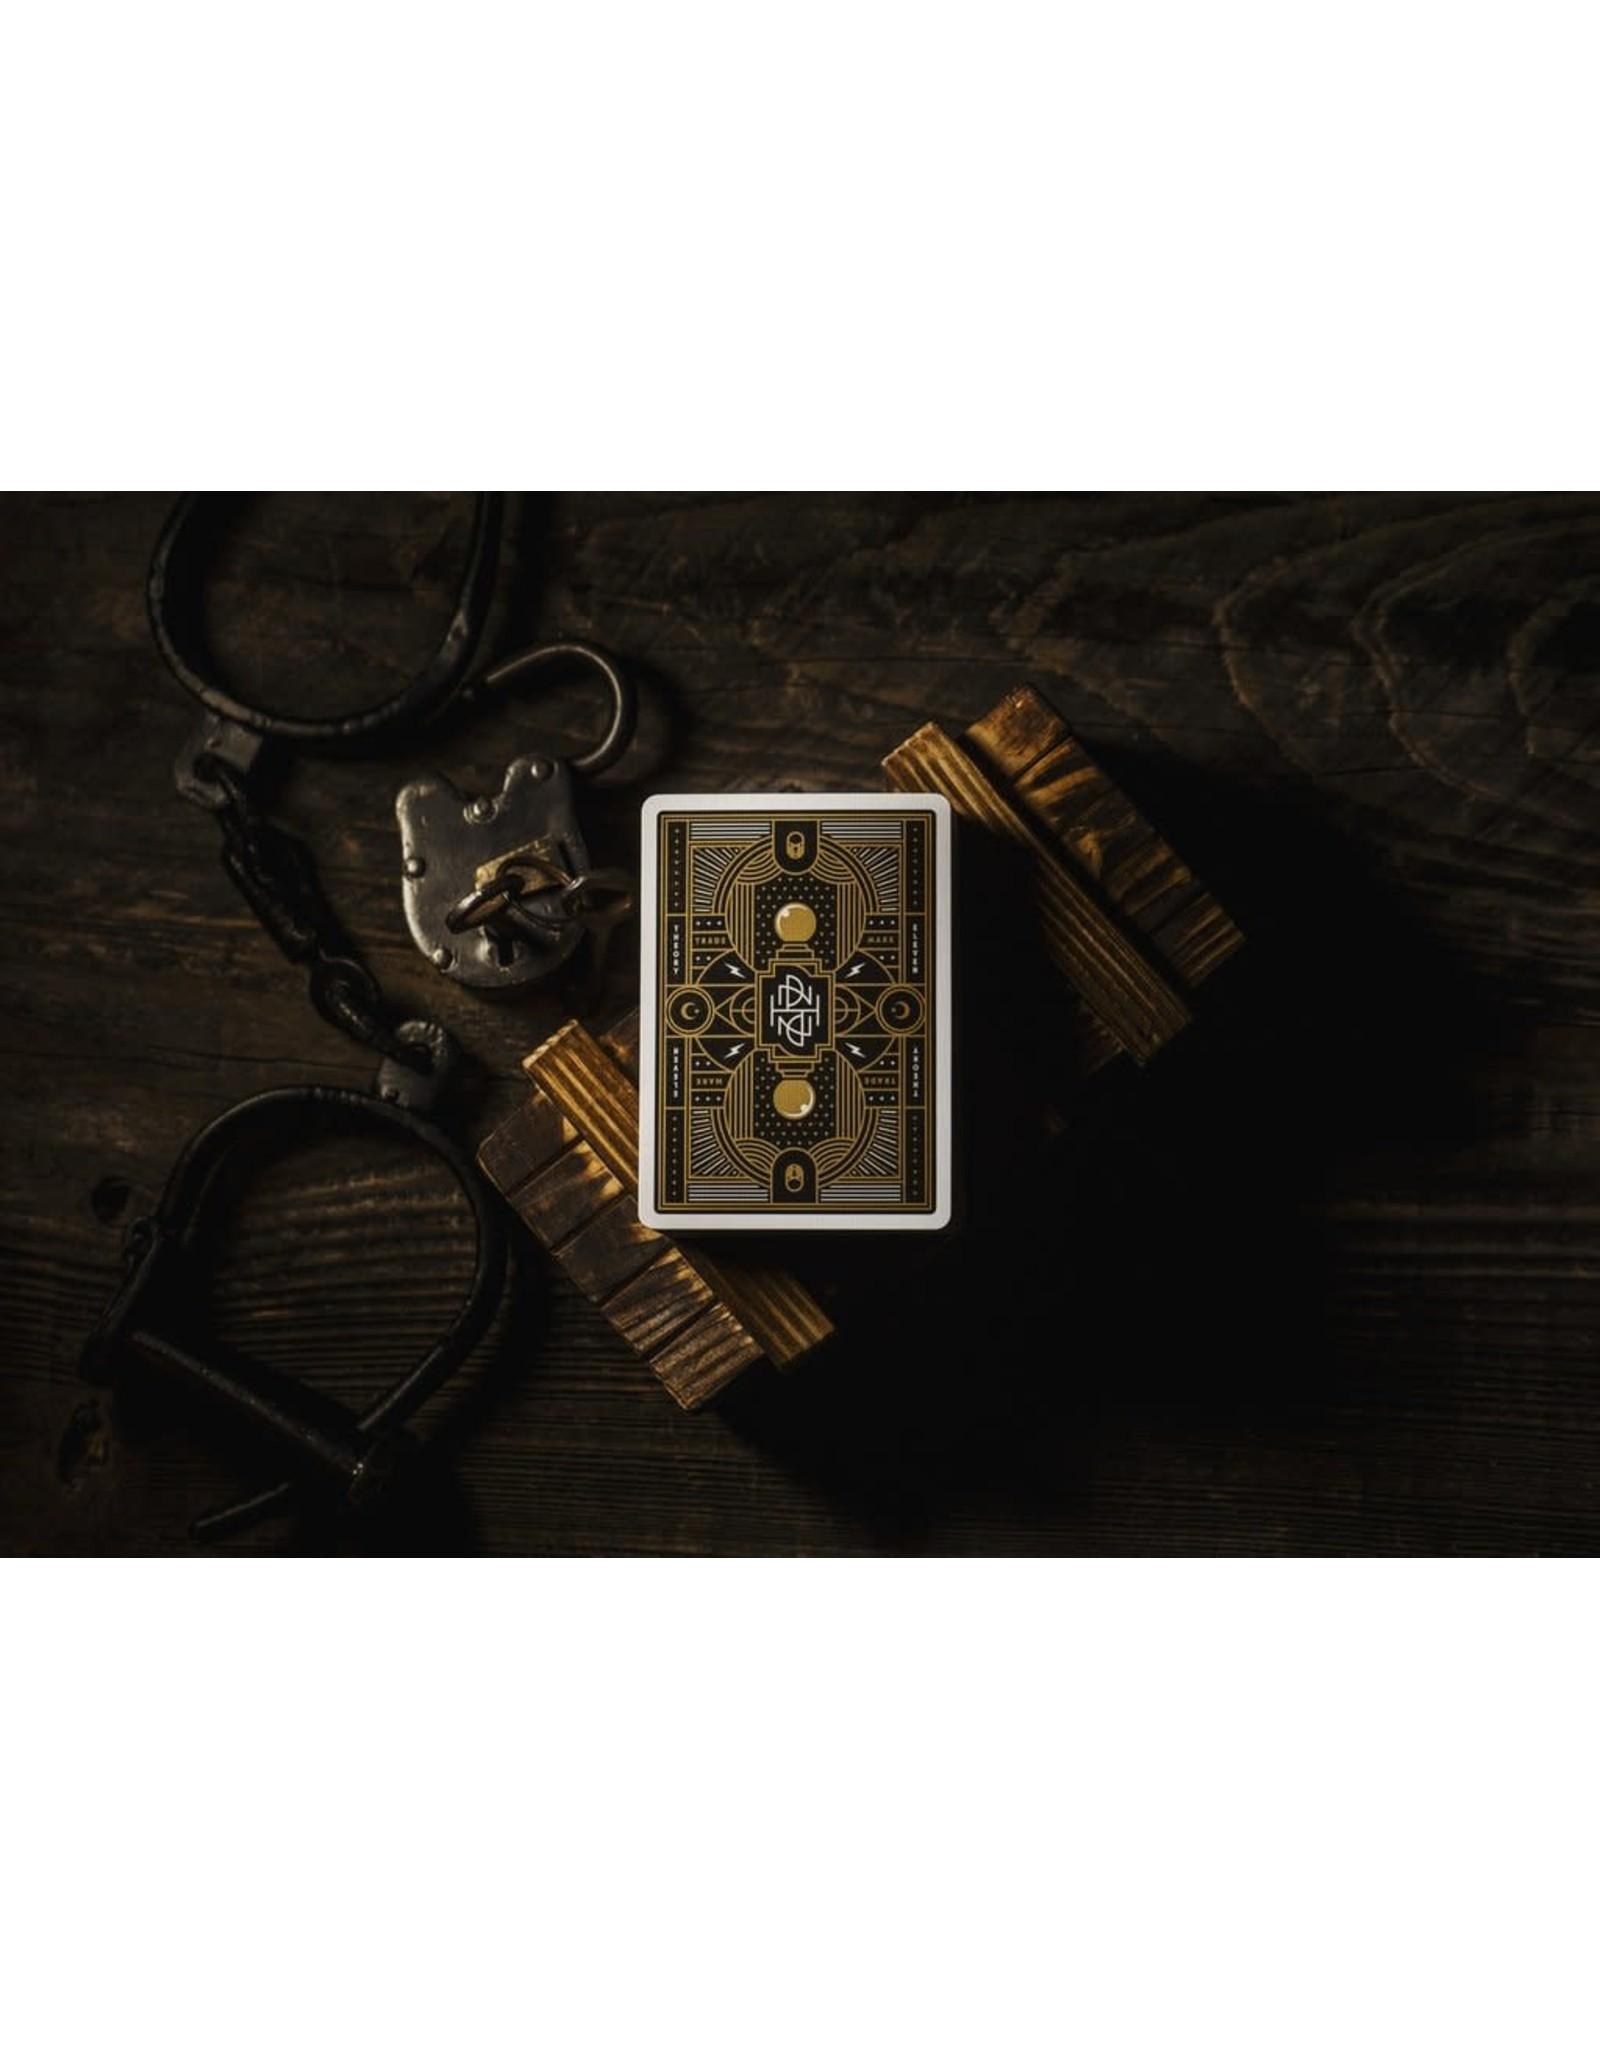 theory11 Theory 11 Cards Neil Patrick Harris